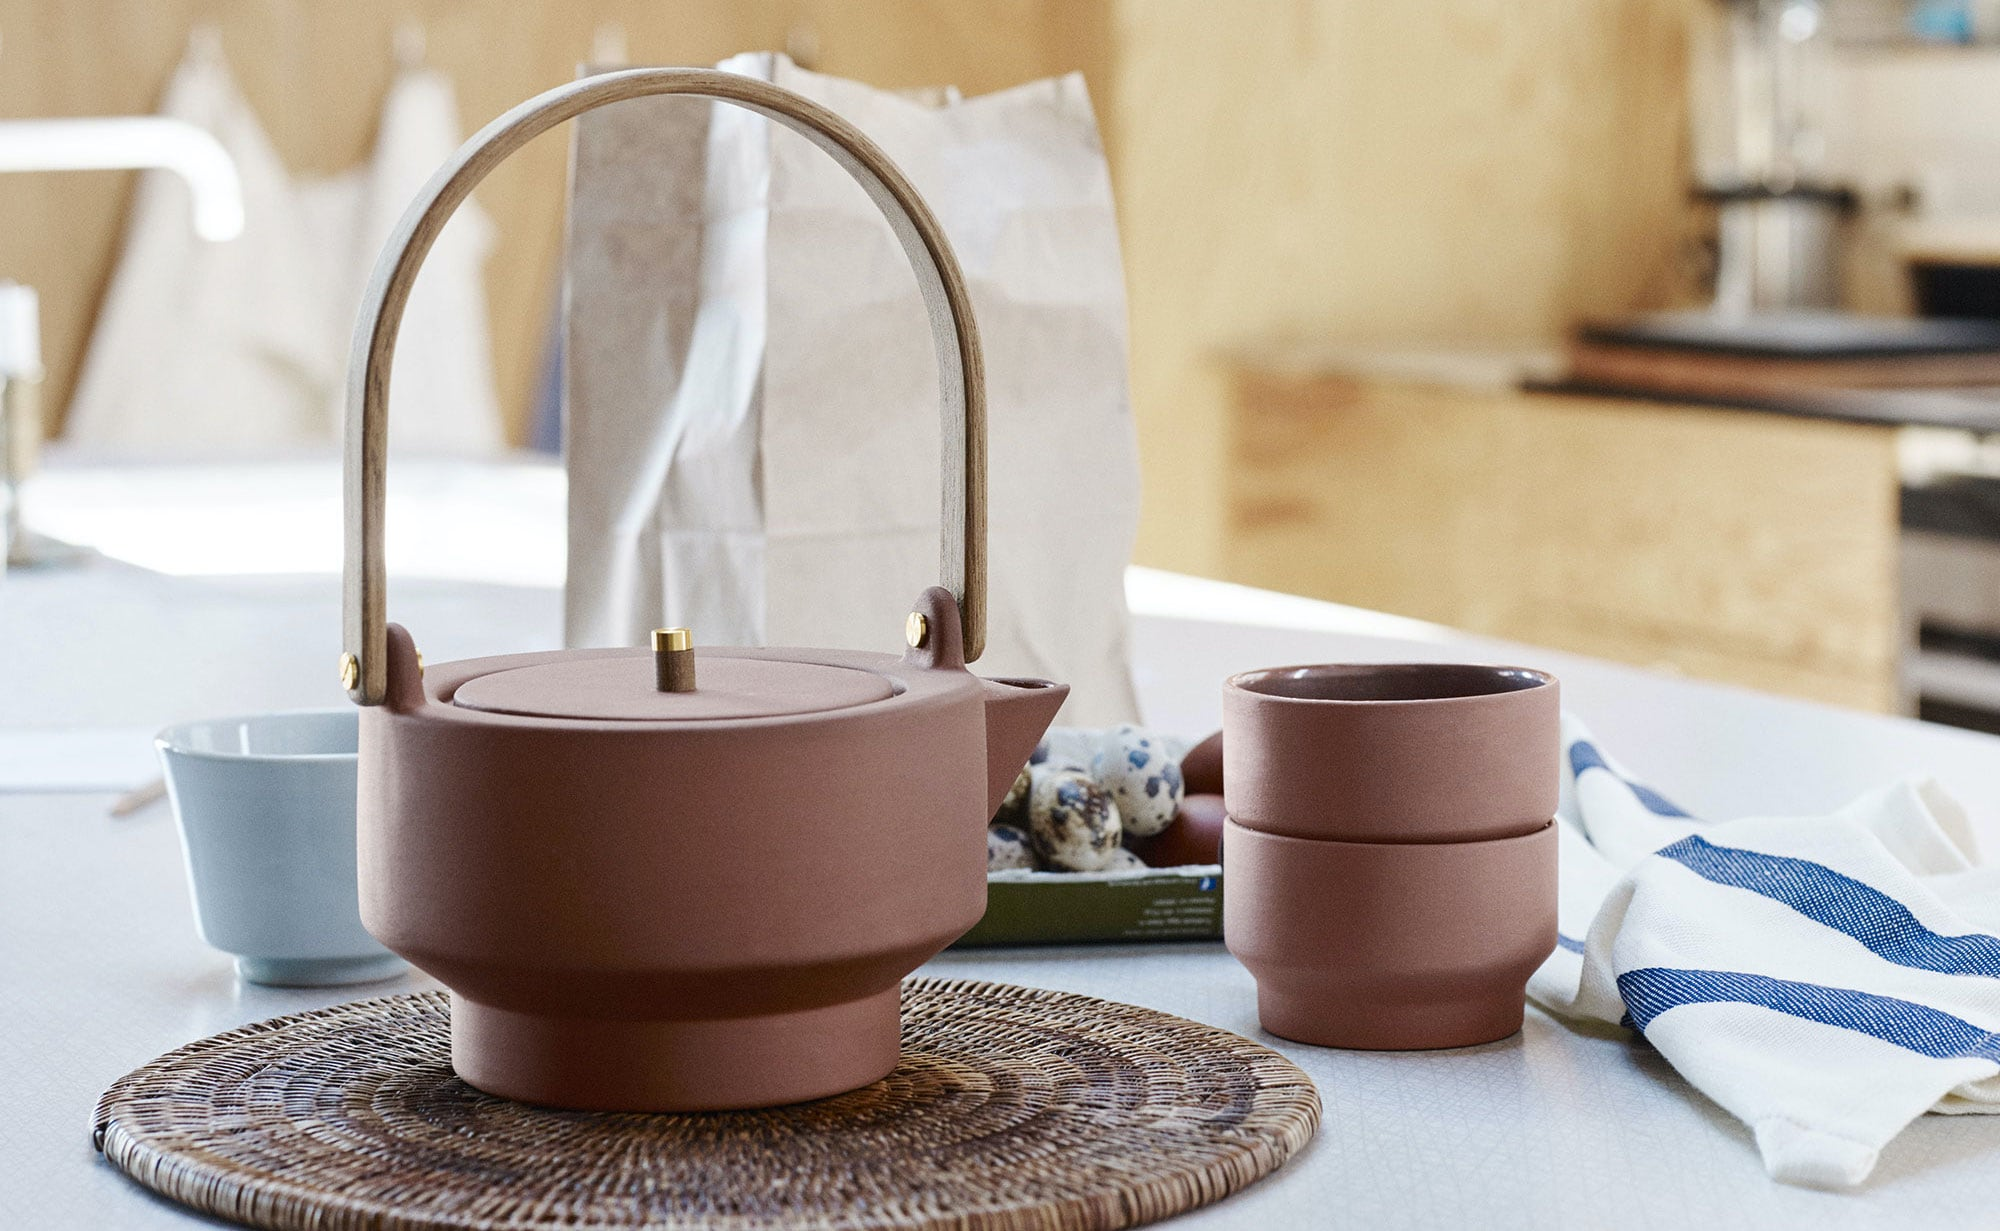 Skagerak Edge Terracotta Teapot is a strikingly simple teatime accessory